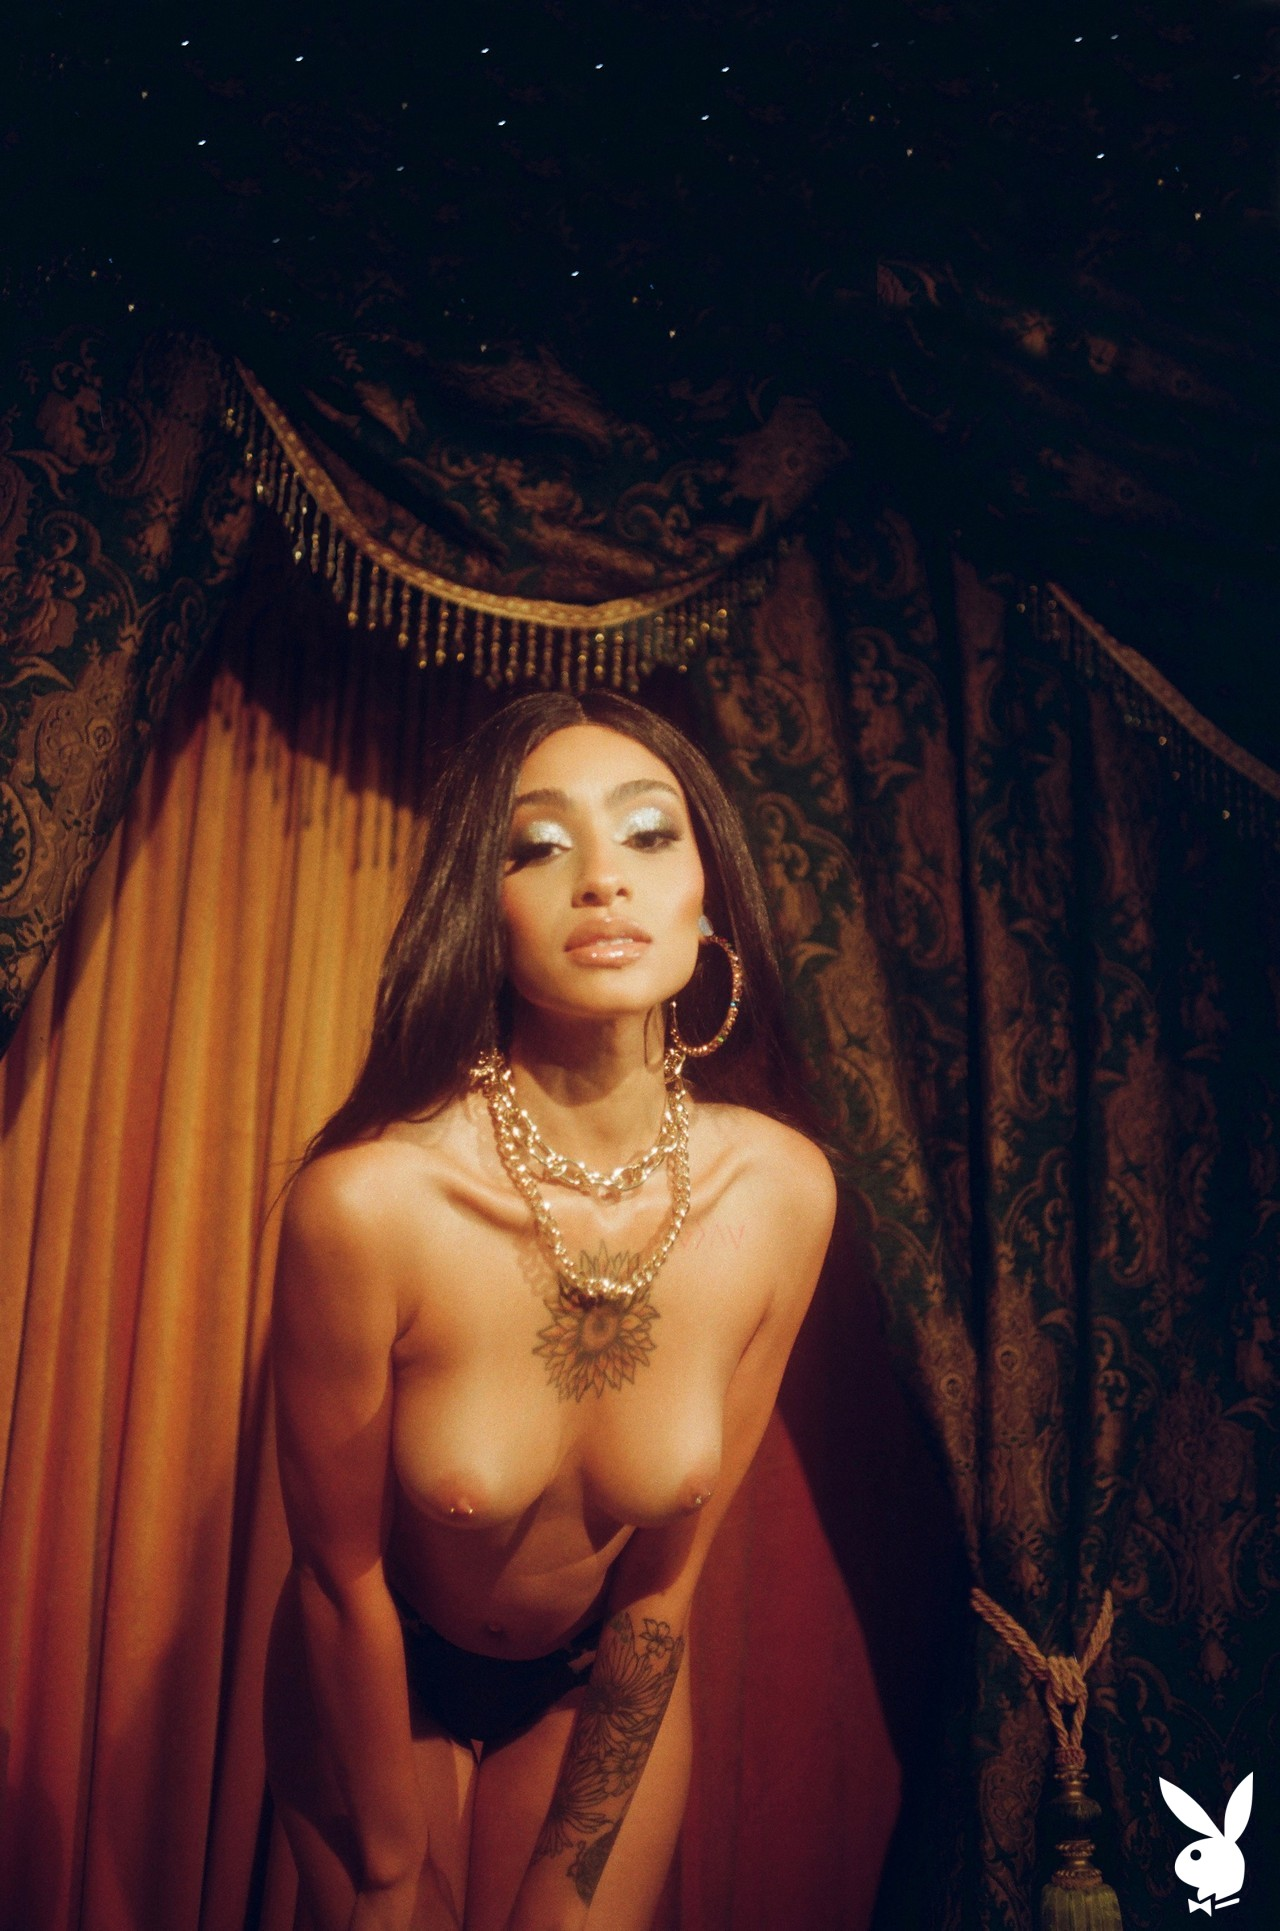 Sunni In Performance Art Playboy Plus (10)